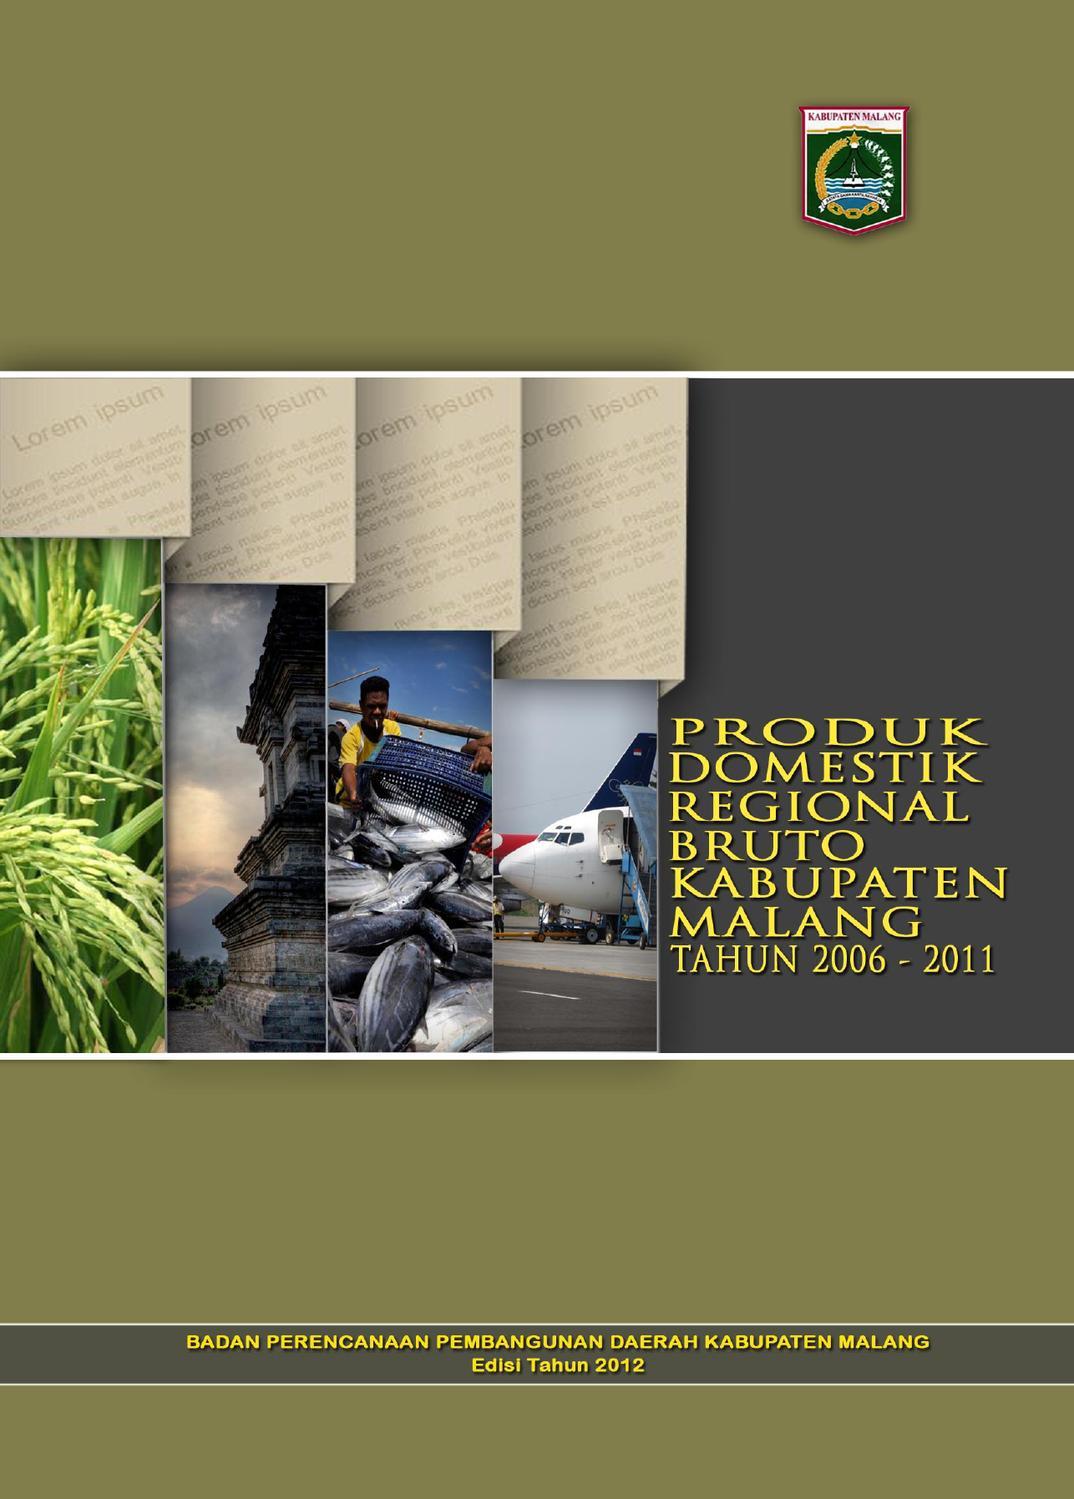 Produk Domestik Regional Bruto Kab. Malang Tahun 2006-2011